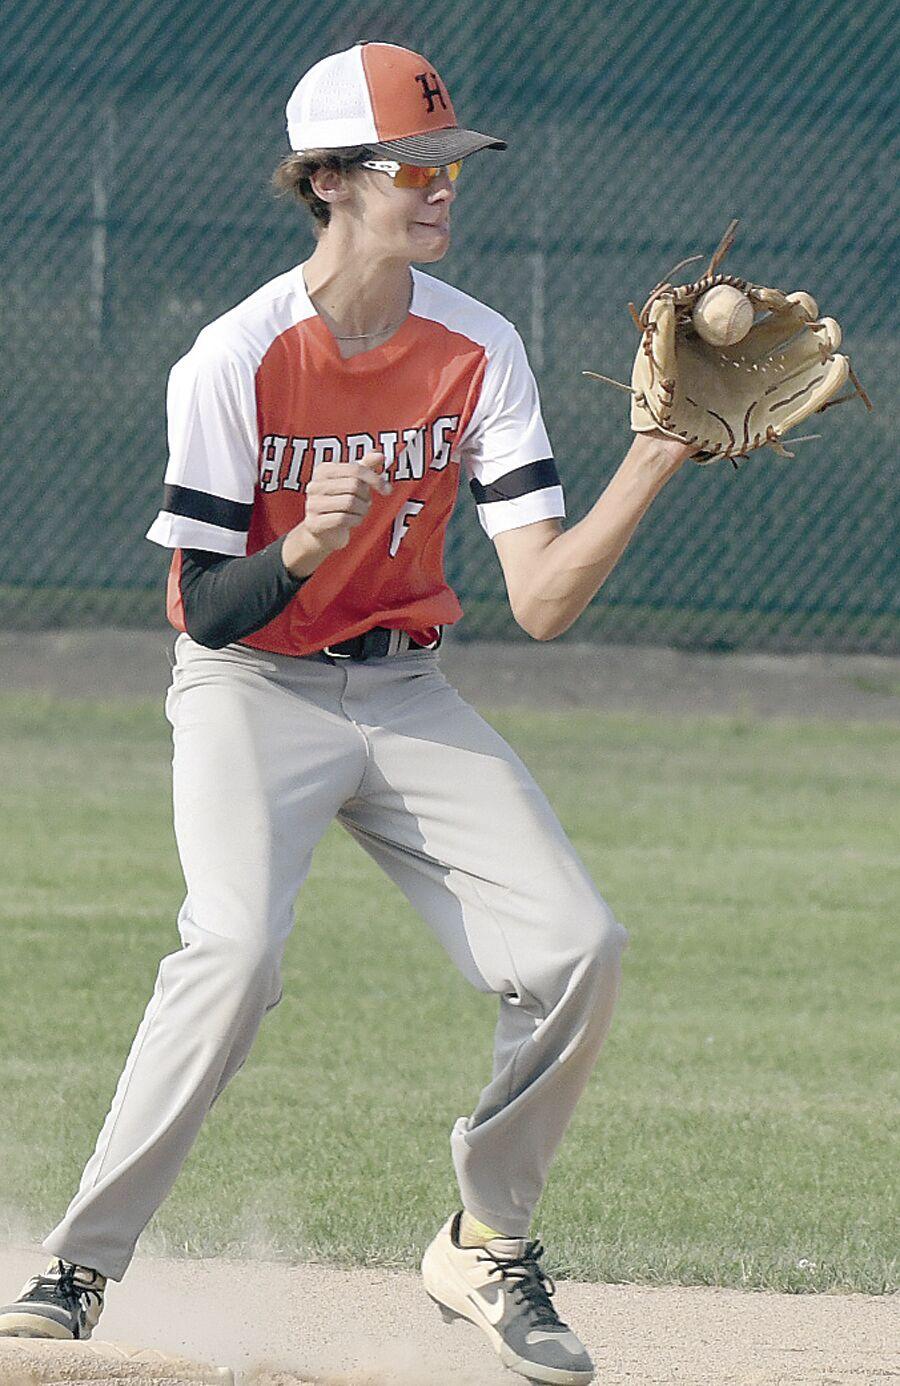 junior league baseball